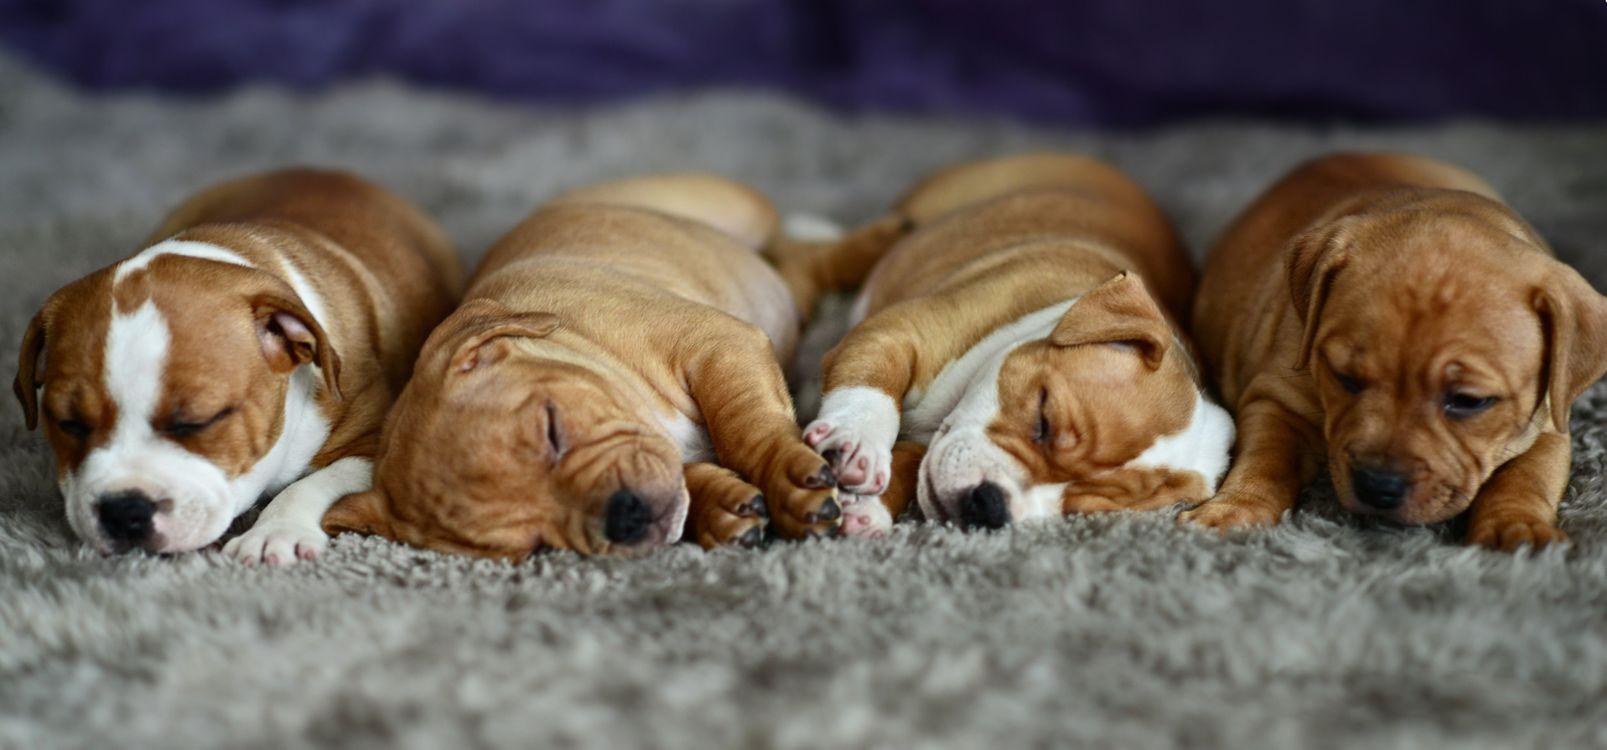 Обои щенки, детки, мило картинки на телефон